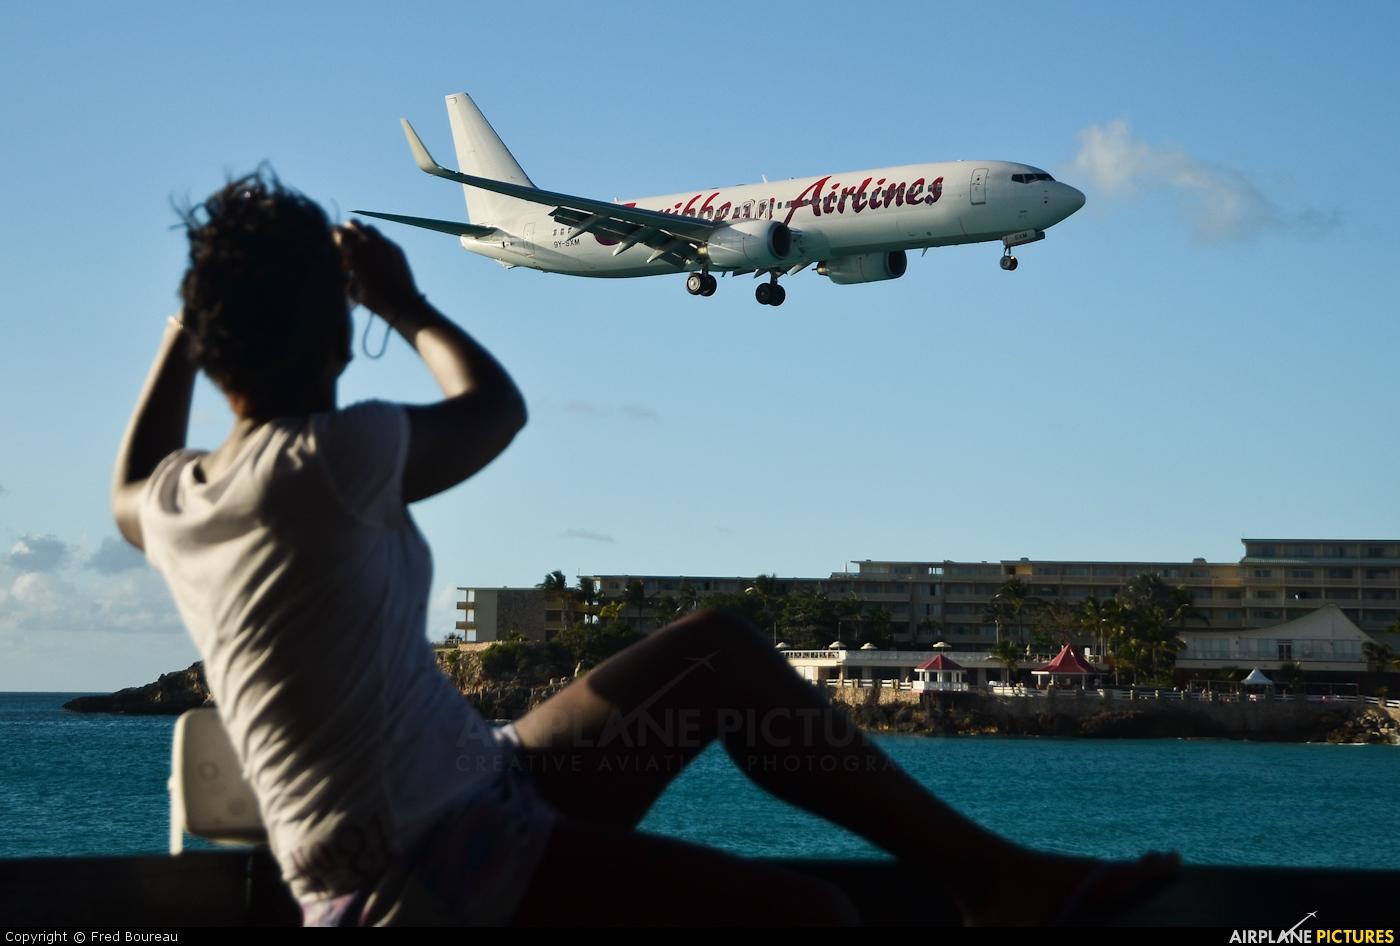 Caribbean Airlines  9Y-SXM aircraft at Sint Maarten - Princess Juliana Intl